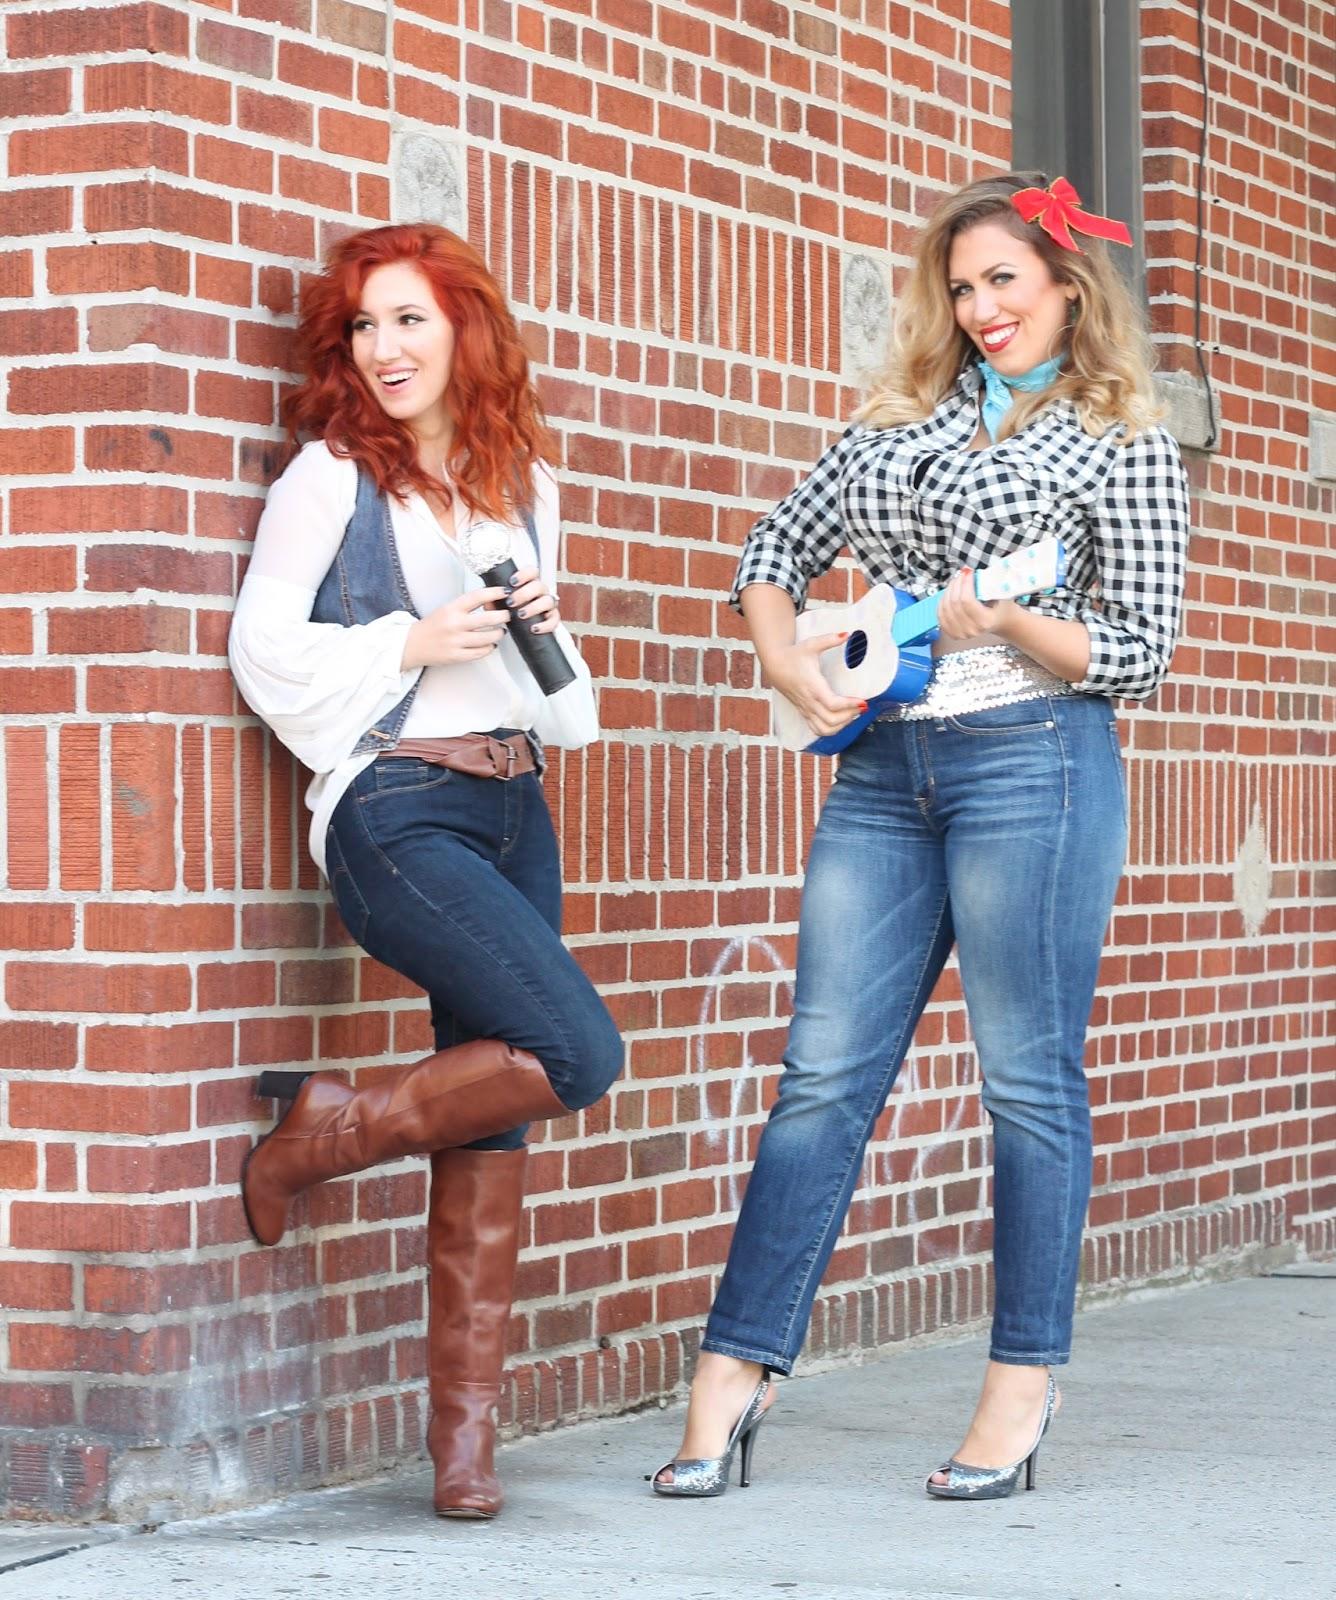 reba costume, dolly costume, country music costume, nashville costume ideas